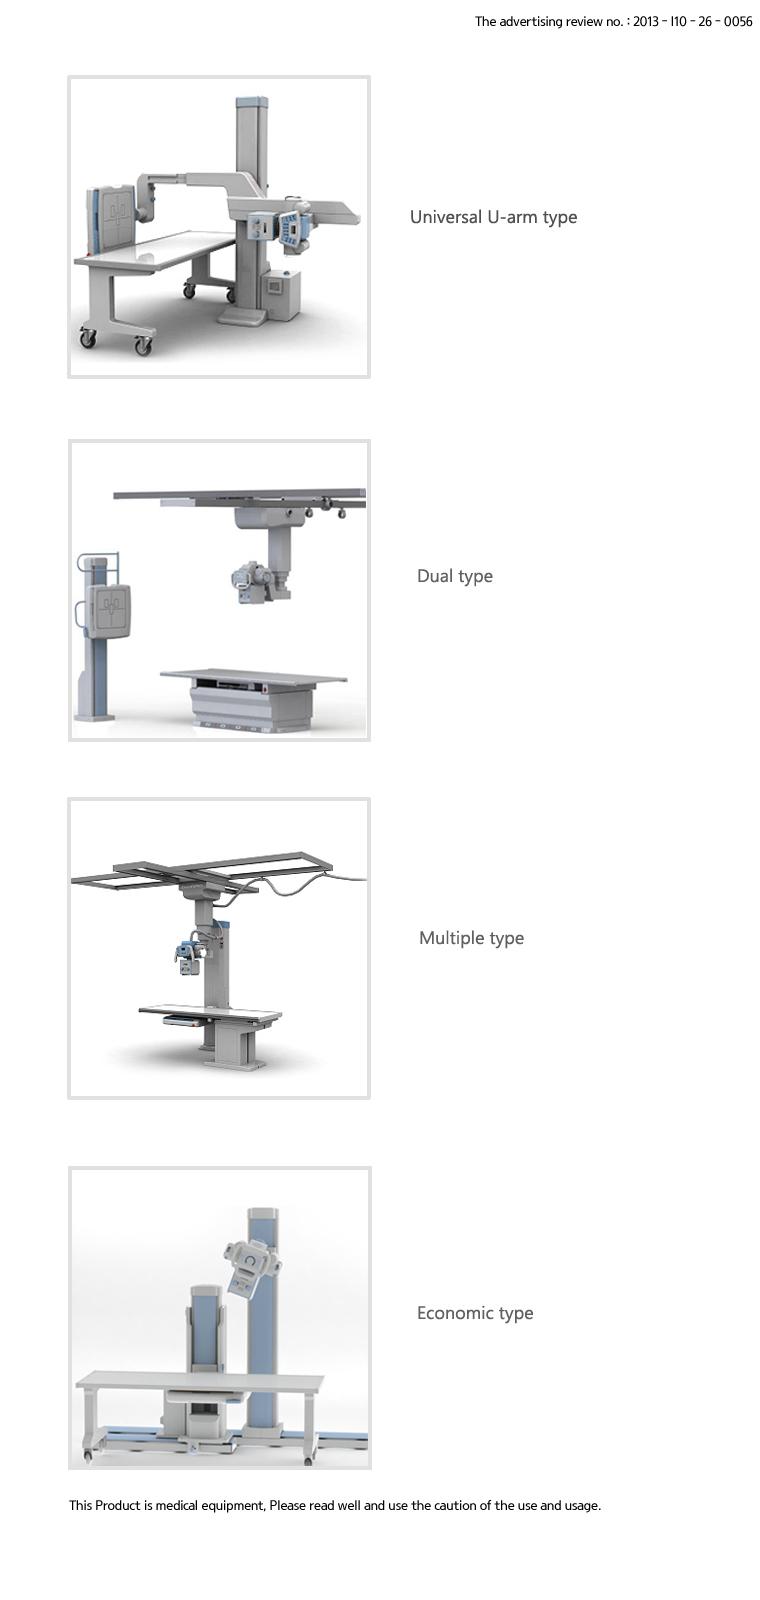 SITEC MEDICAL Digital Radiography System Flat Panel DR (DigiRAD-FP Series)